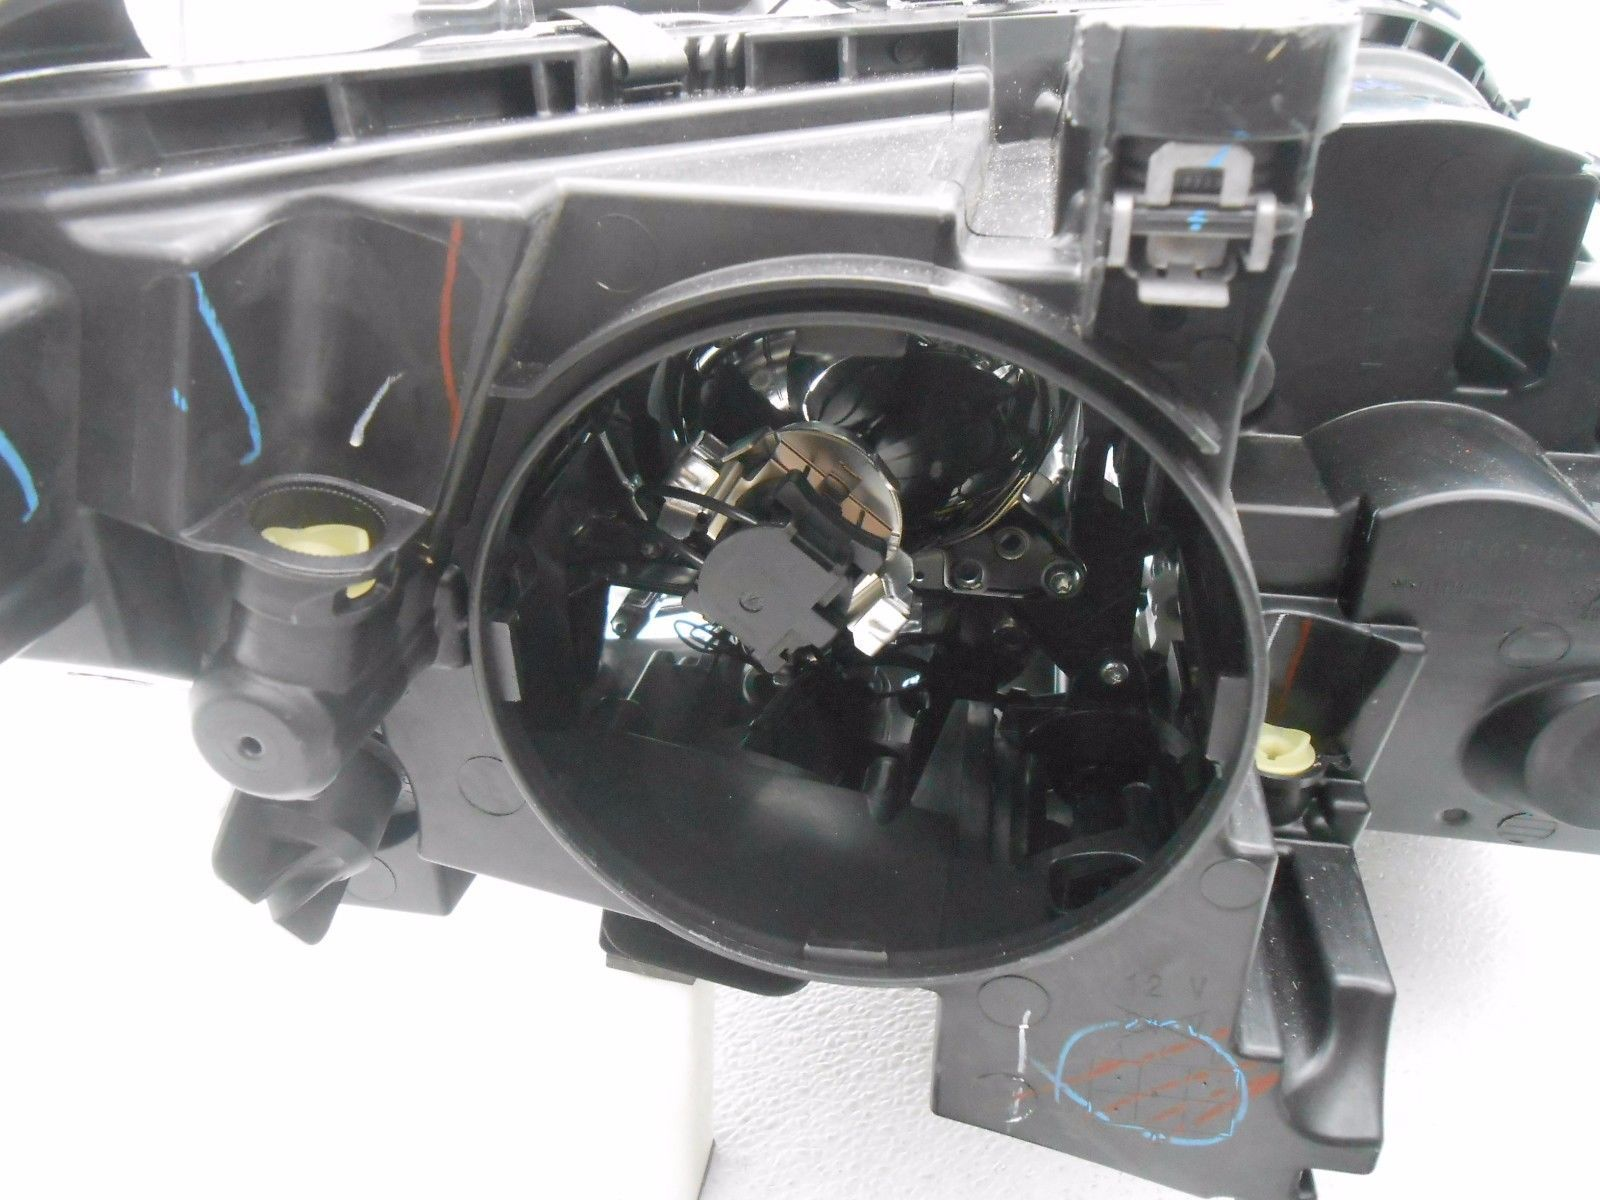 Oem mercedes ml250 ml350 ml400 ml550 left halogen headlamp for Mercedes benz ml350 headlight bulb